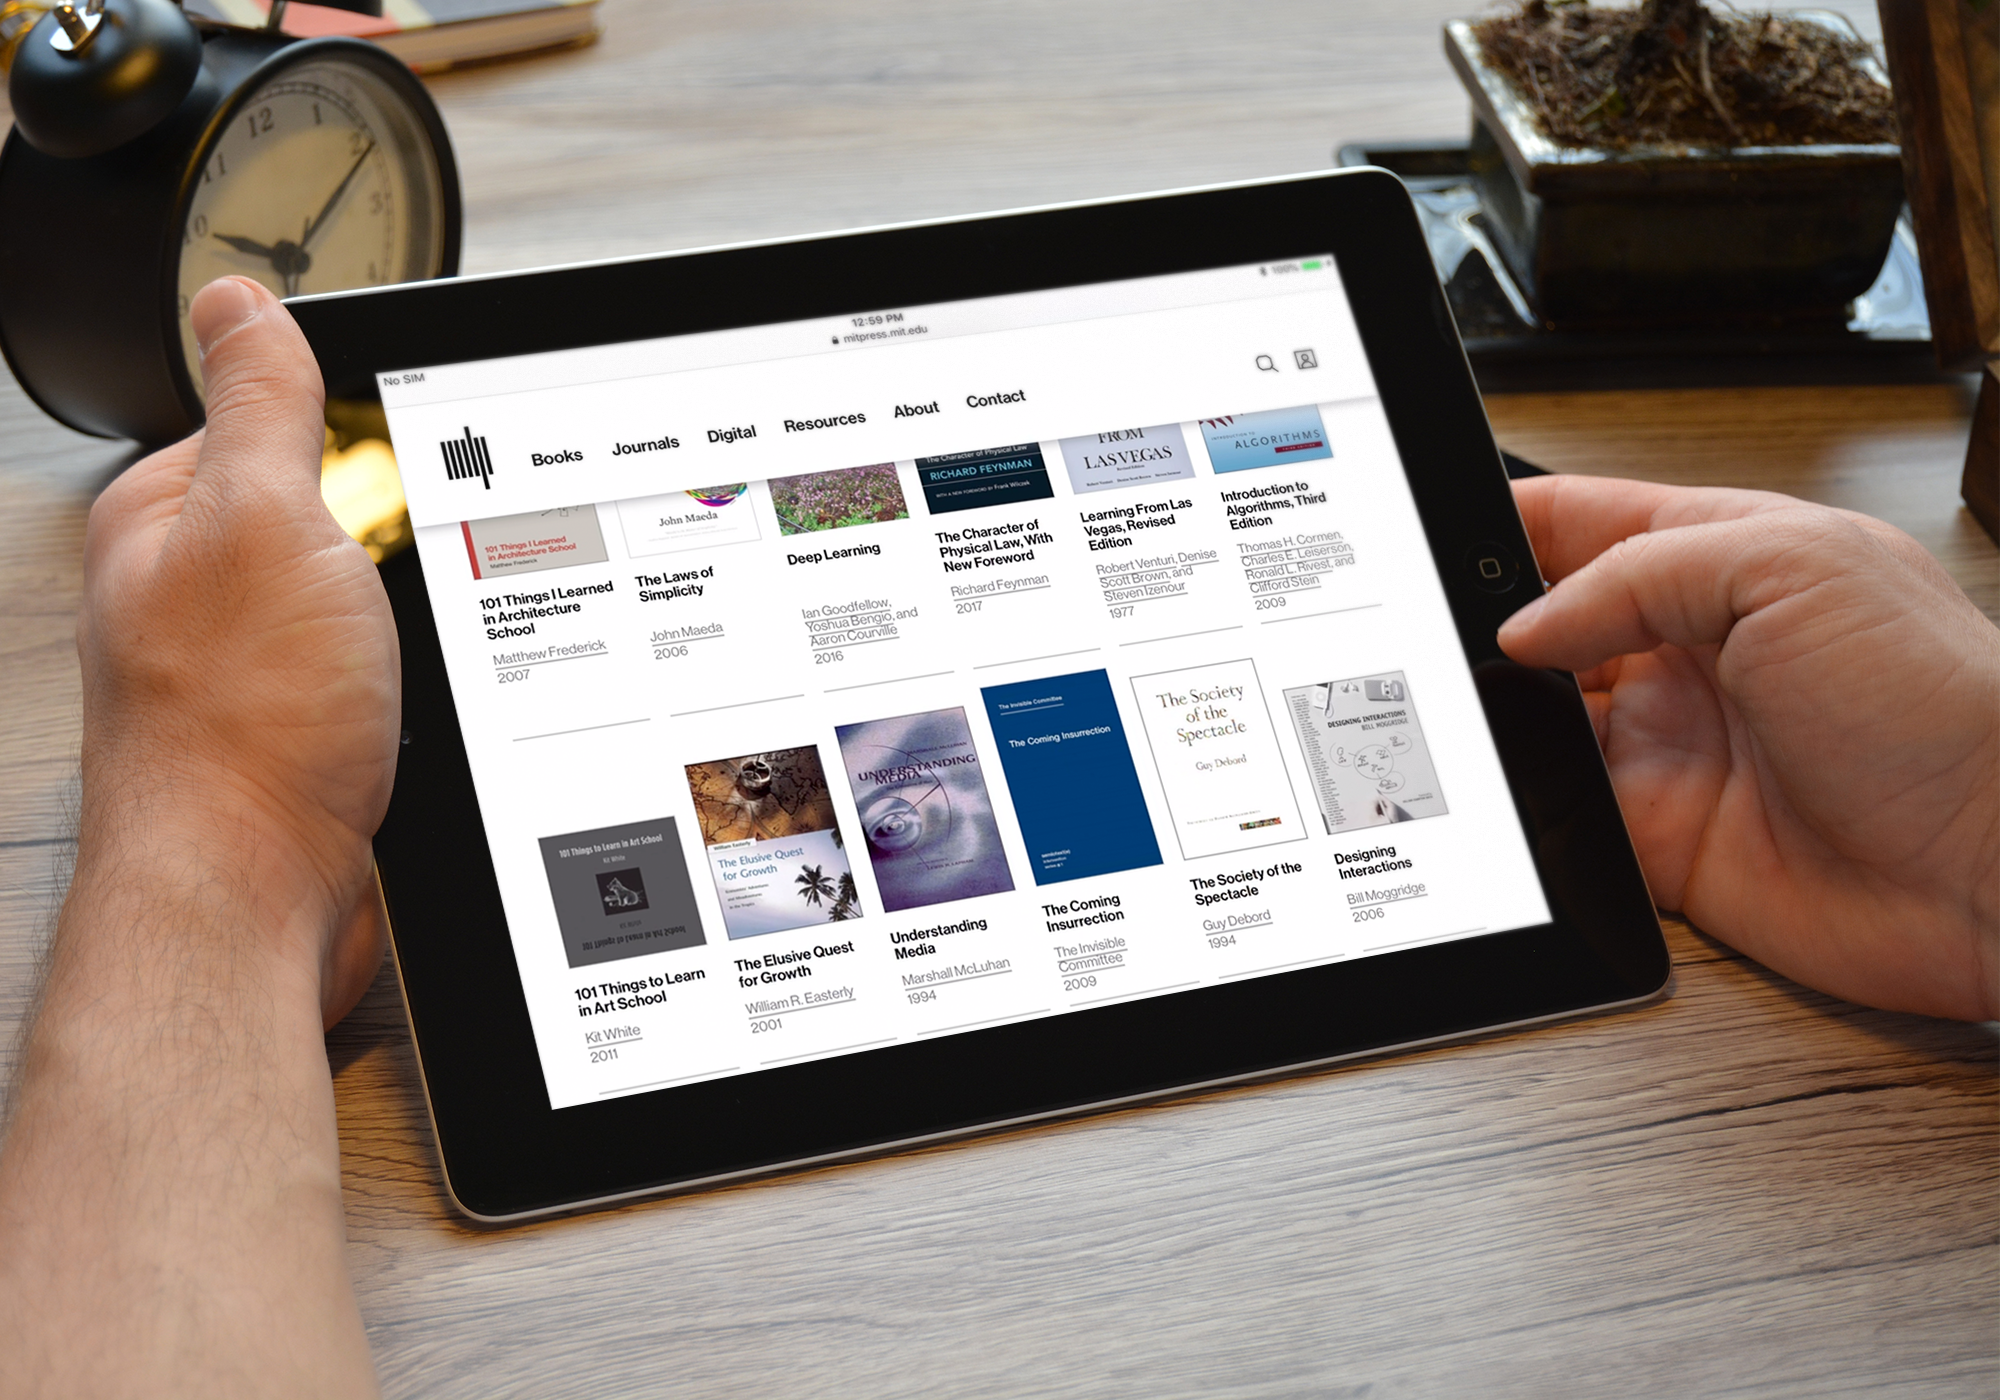 MIT Press books on tablet